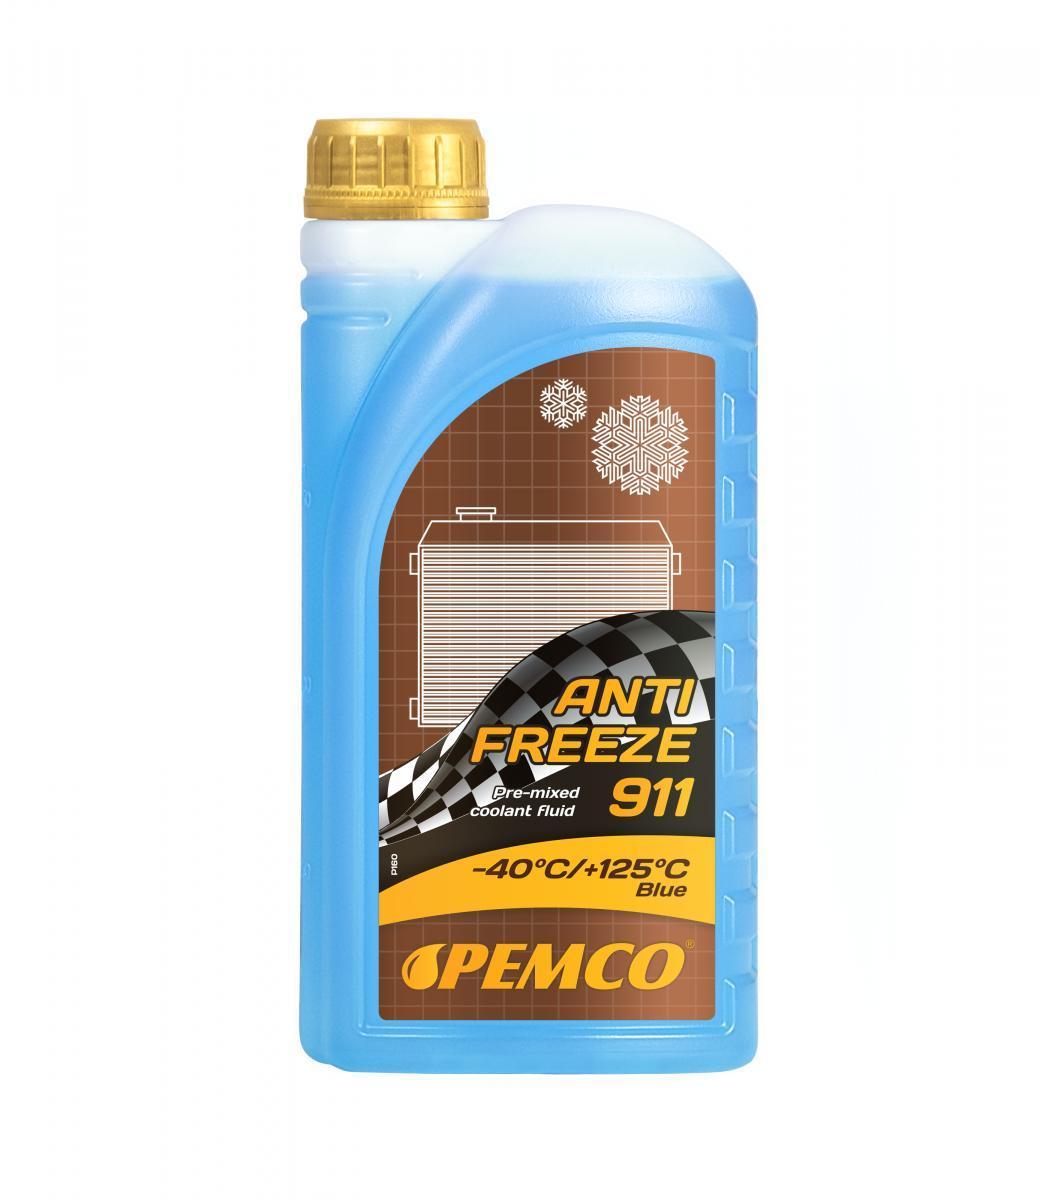 Liquido refrigerante PM0911-1 acquista online 24/7